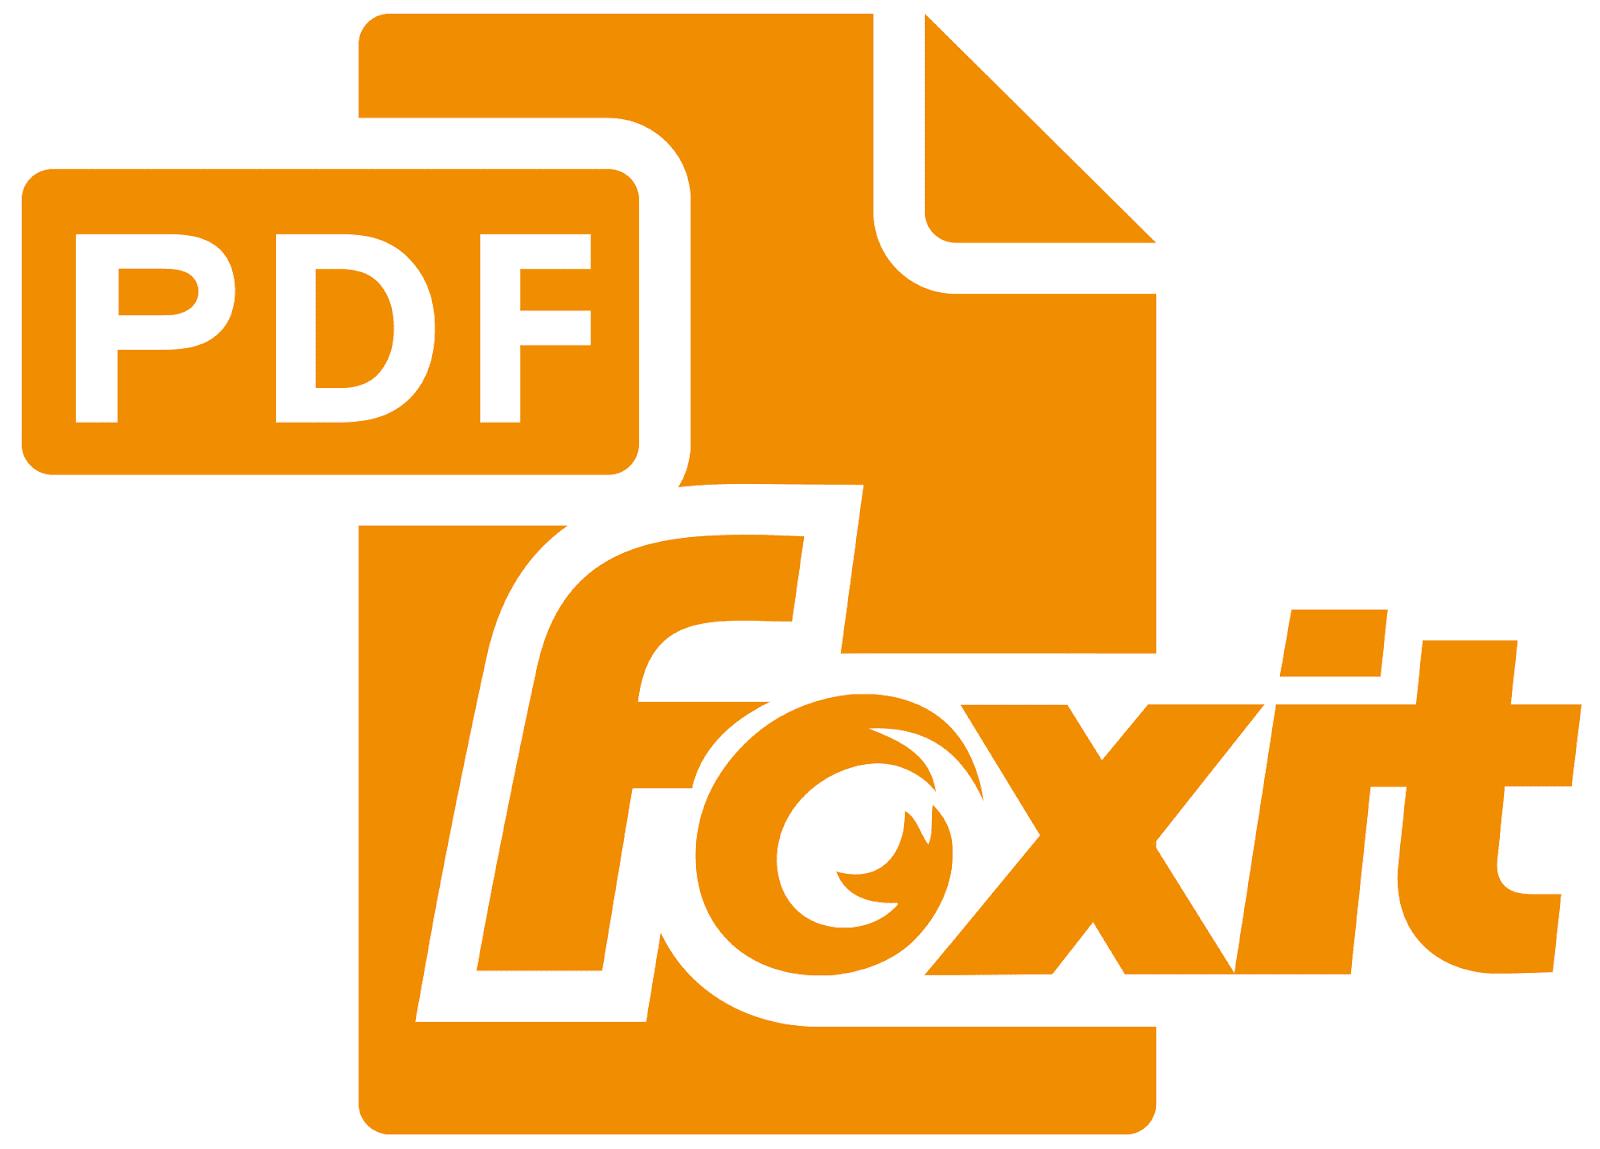 Giới thiệu về Foxit Reader Full Crack